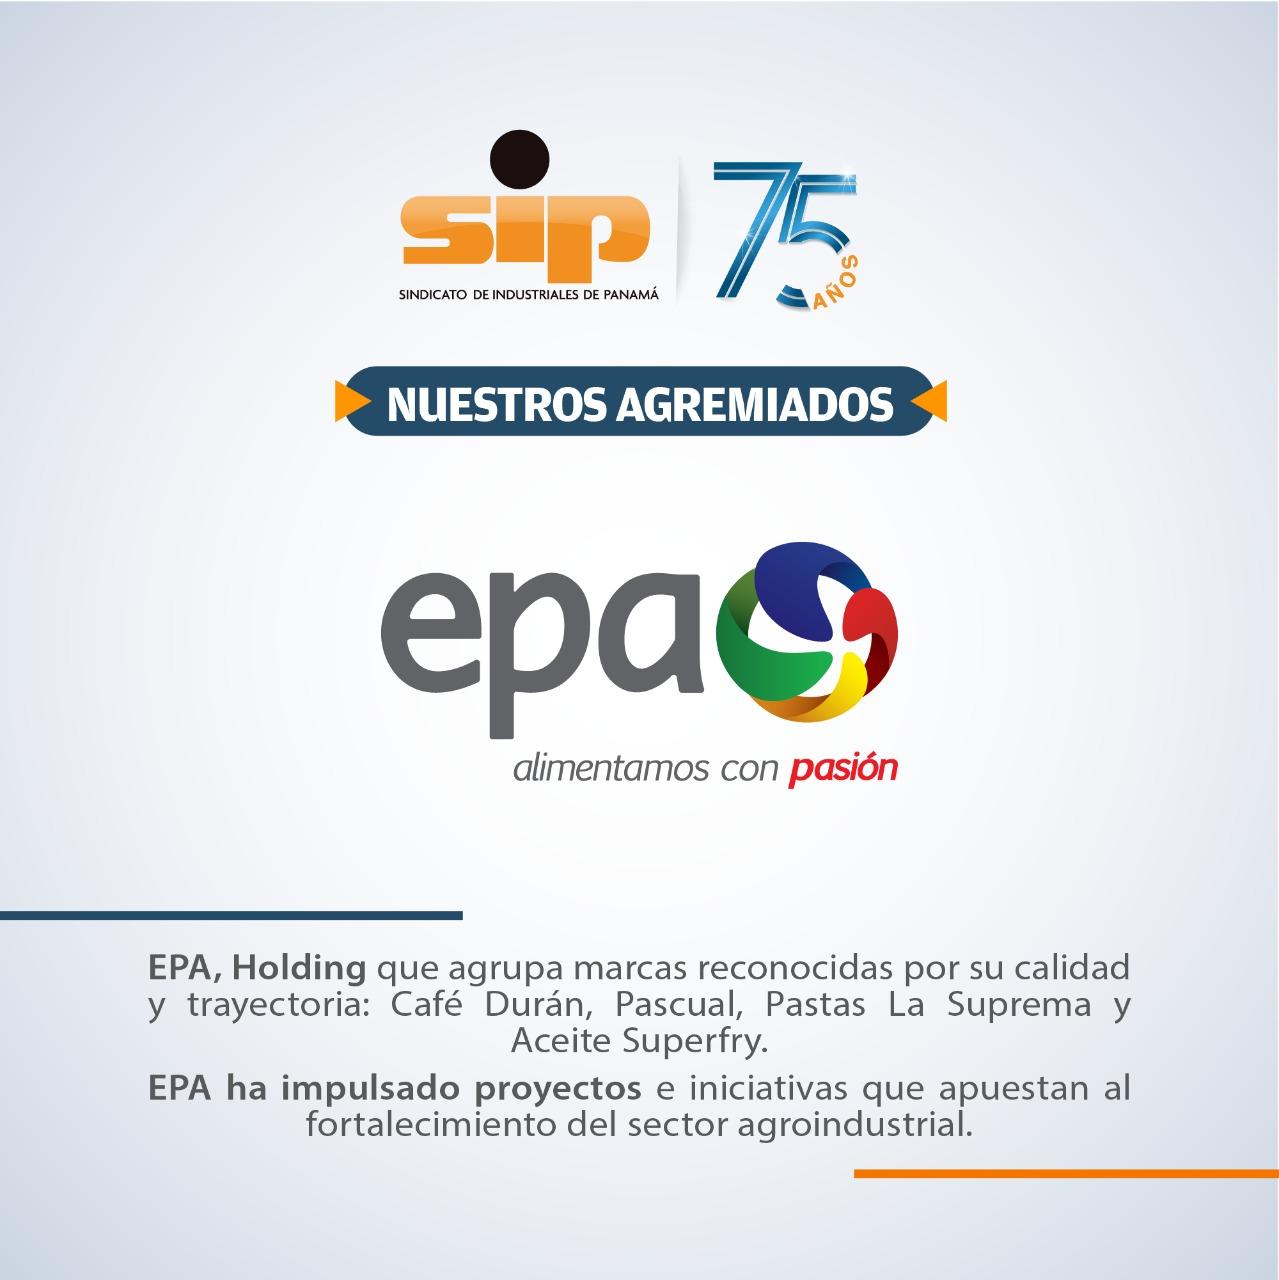 EPA, Holding